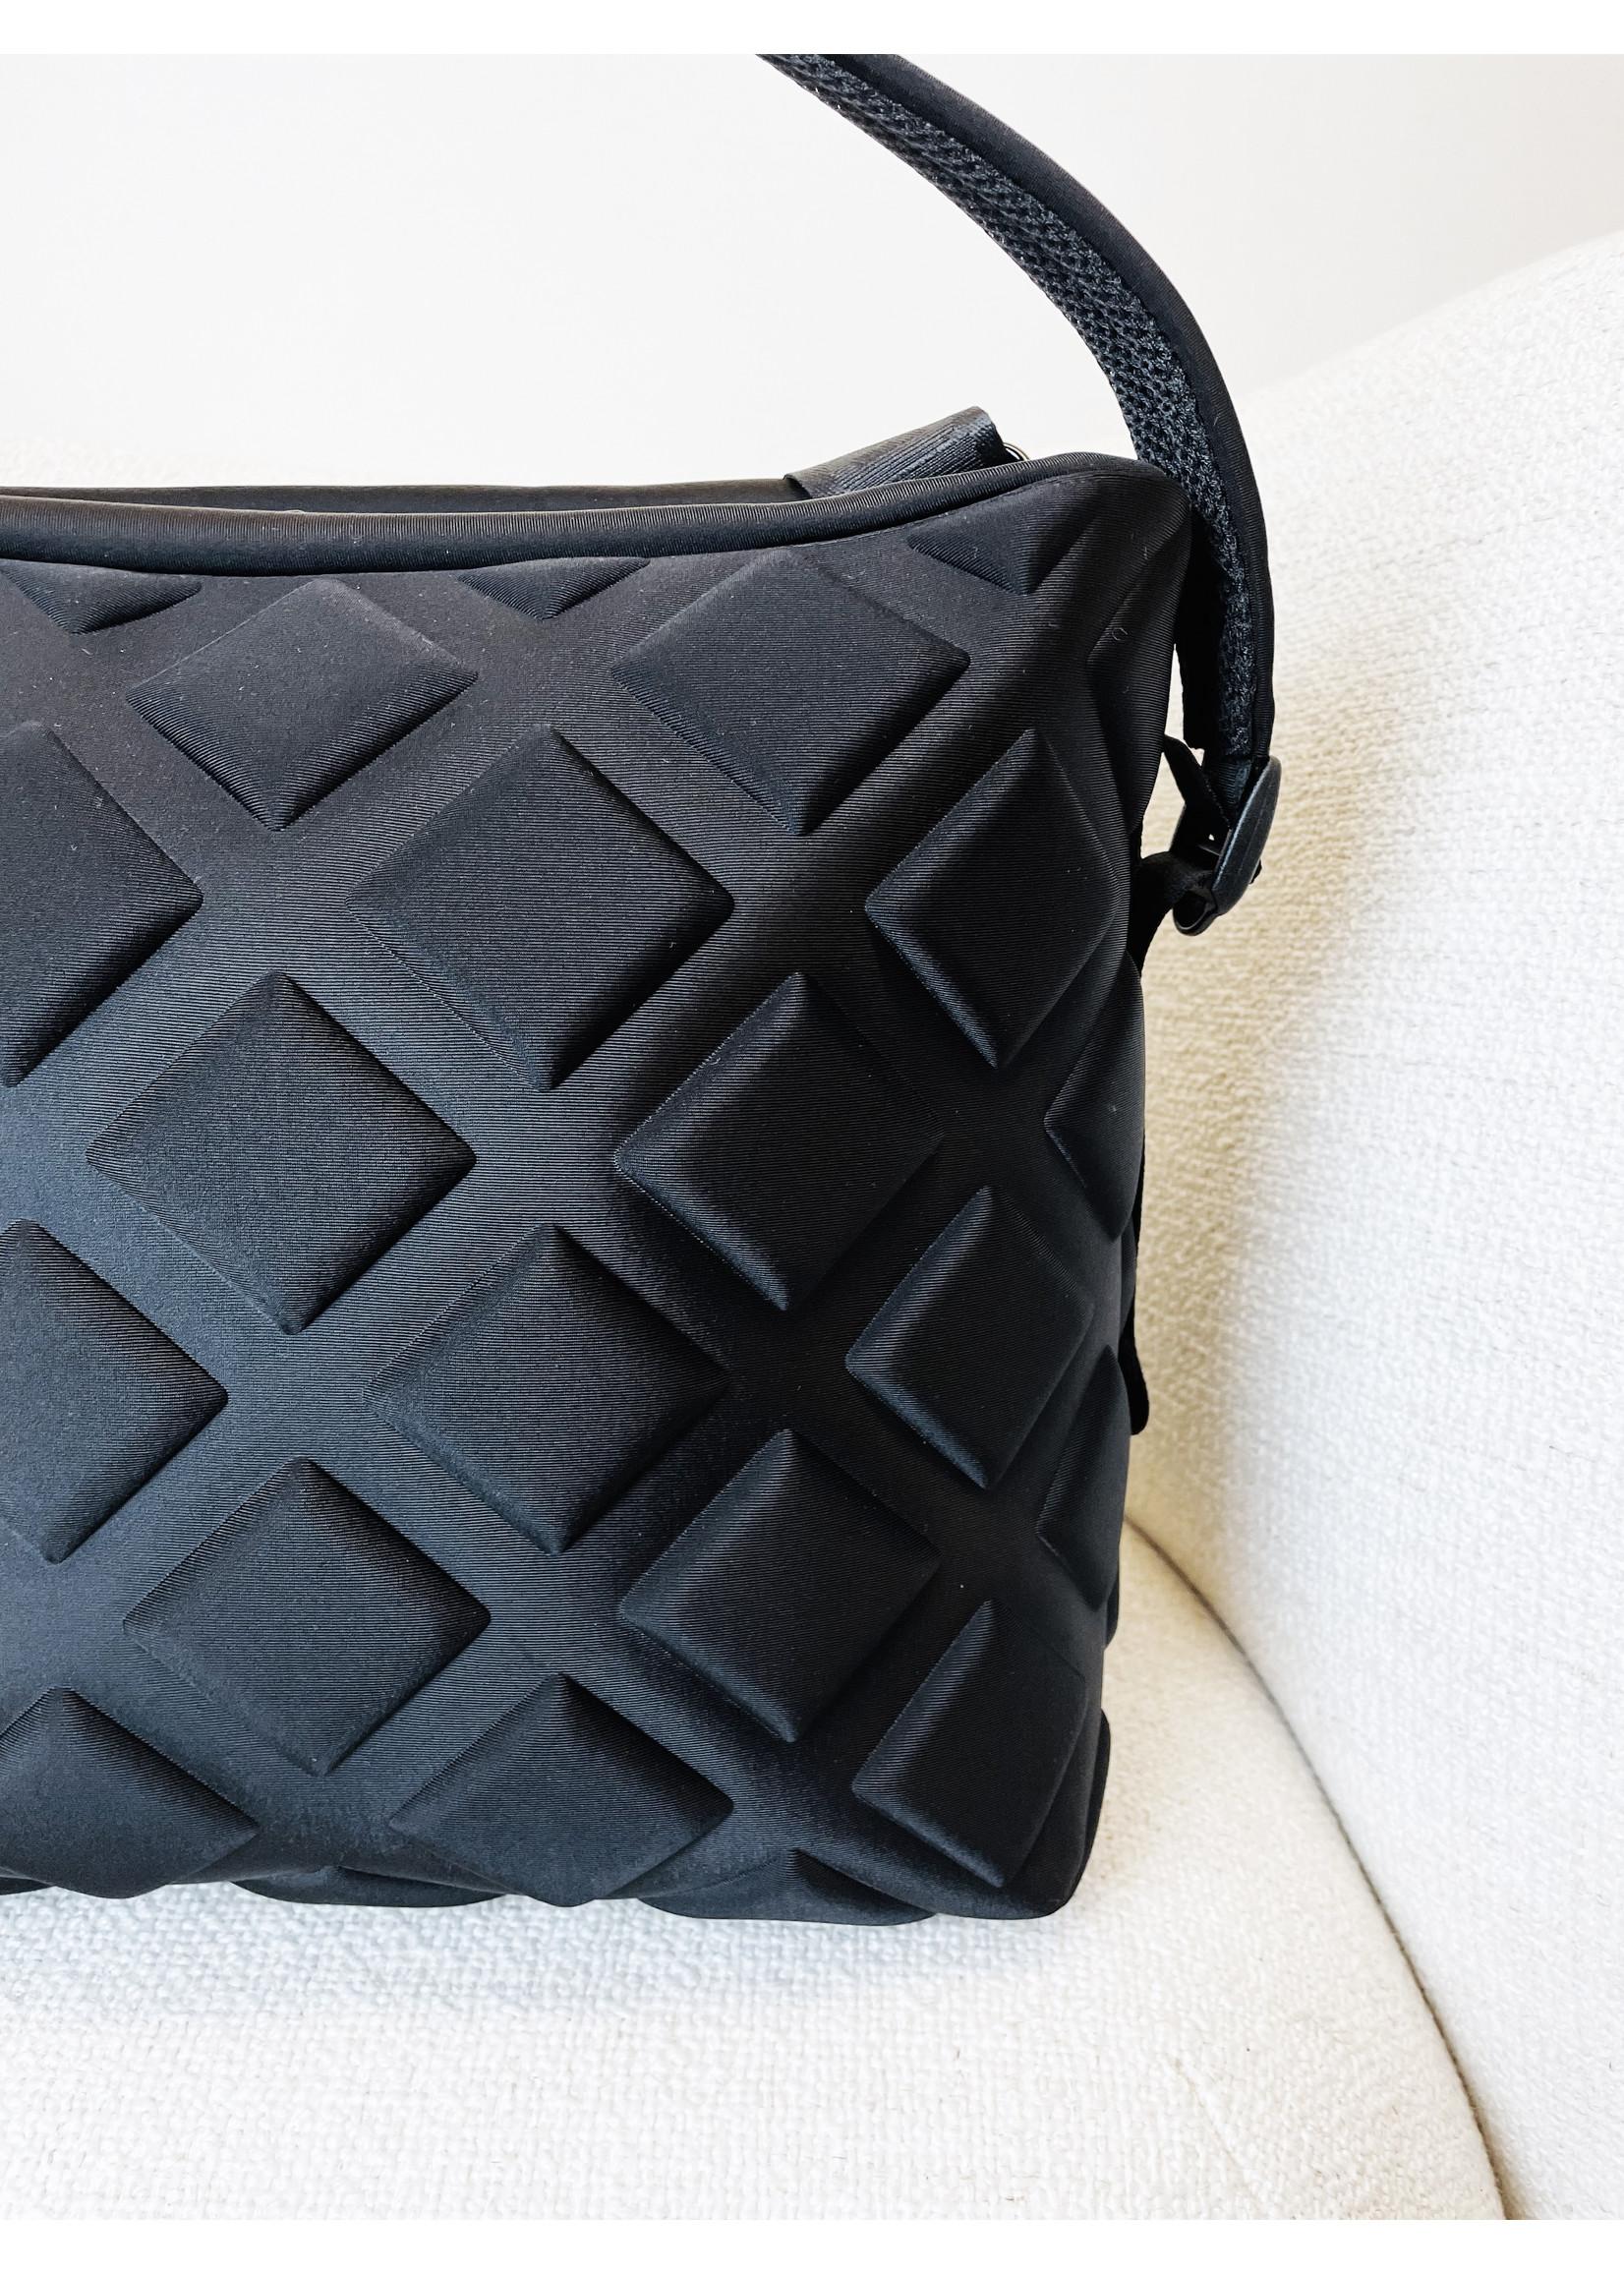 Marccain Bags & Shoes Handtas RB TJ.06 J05 black